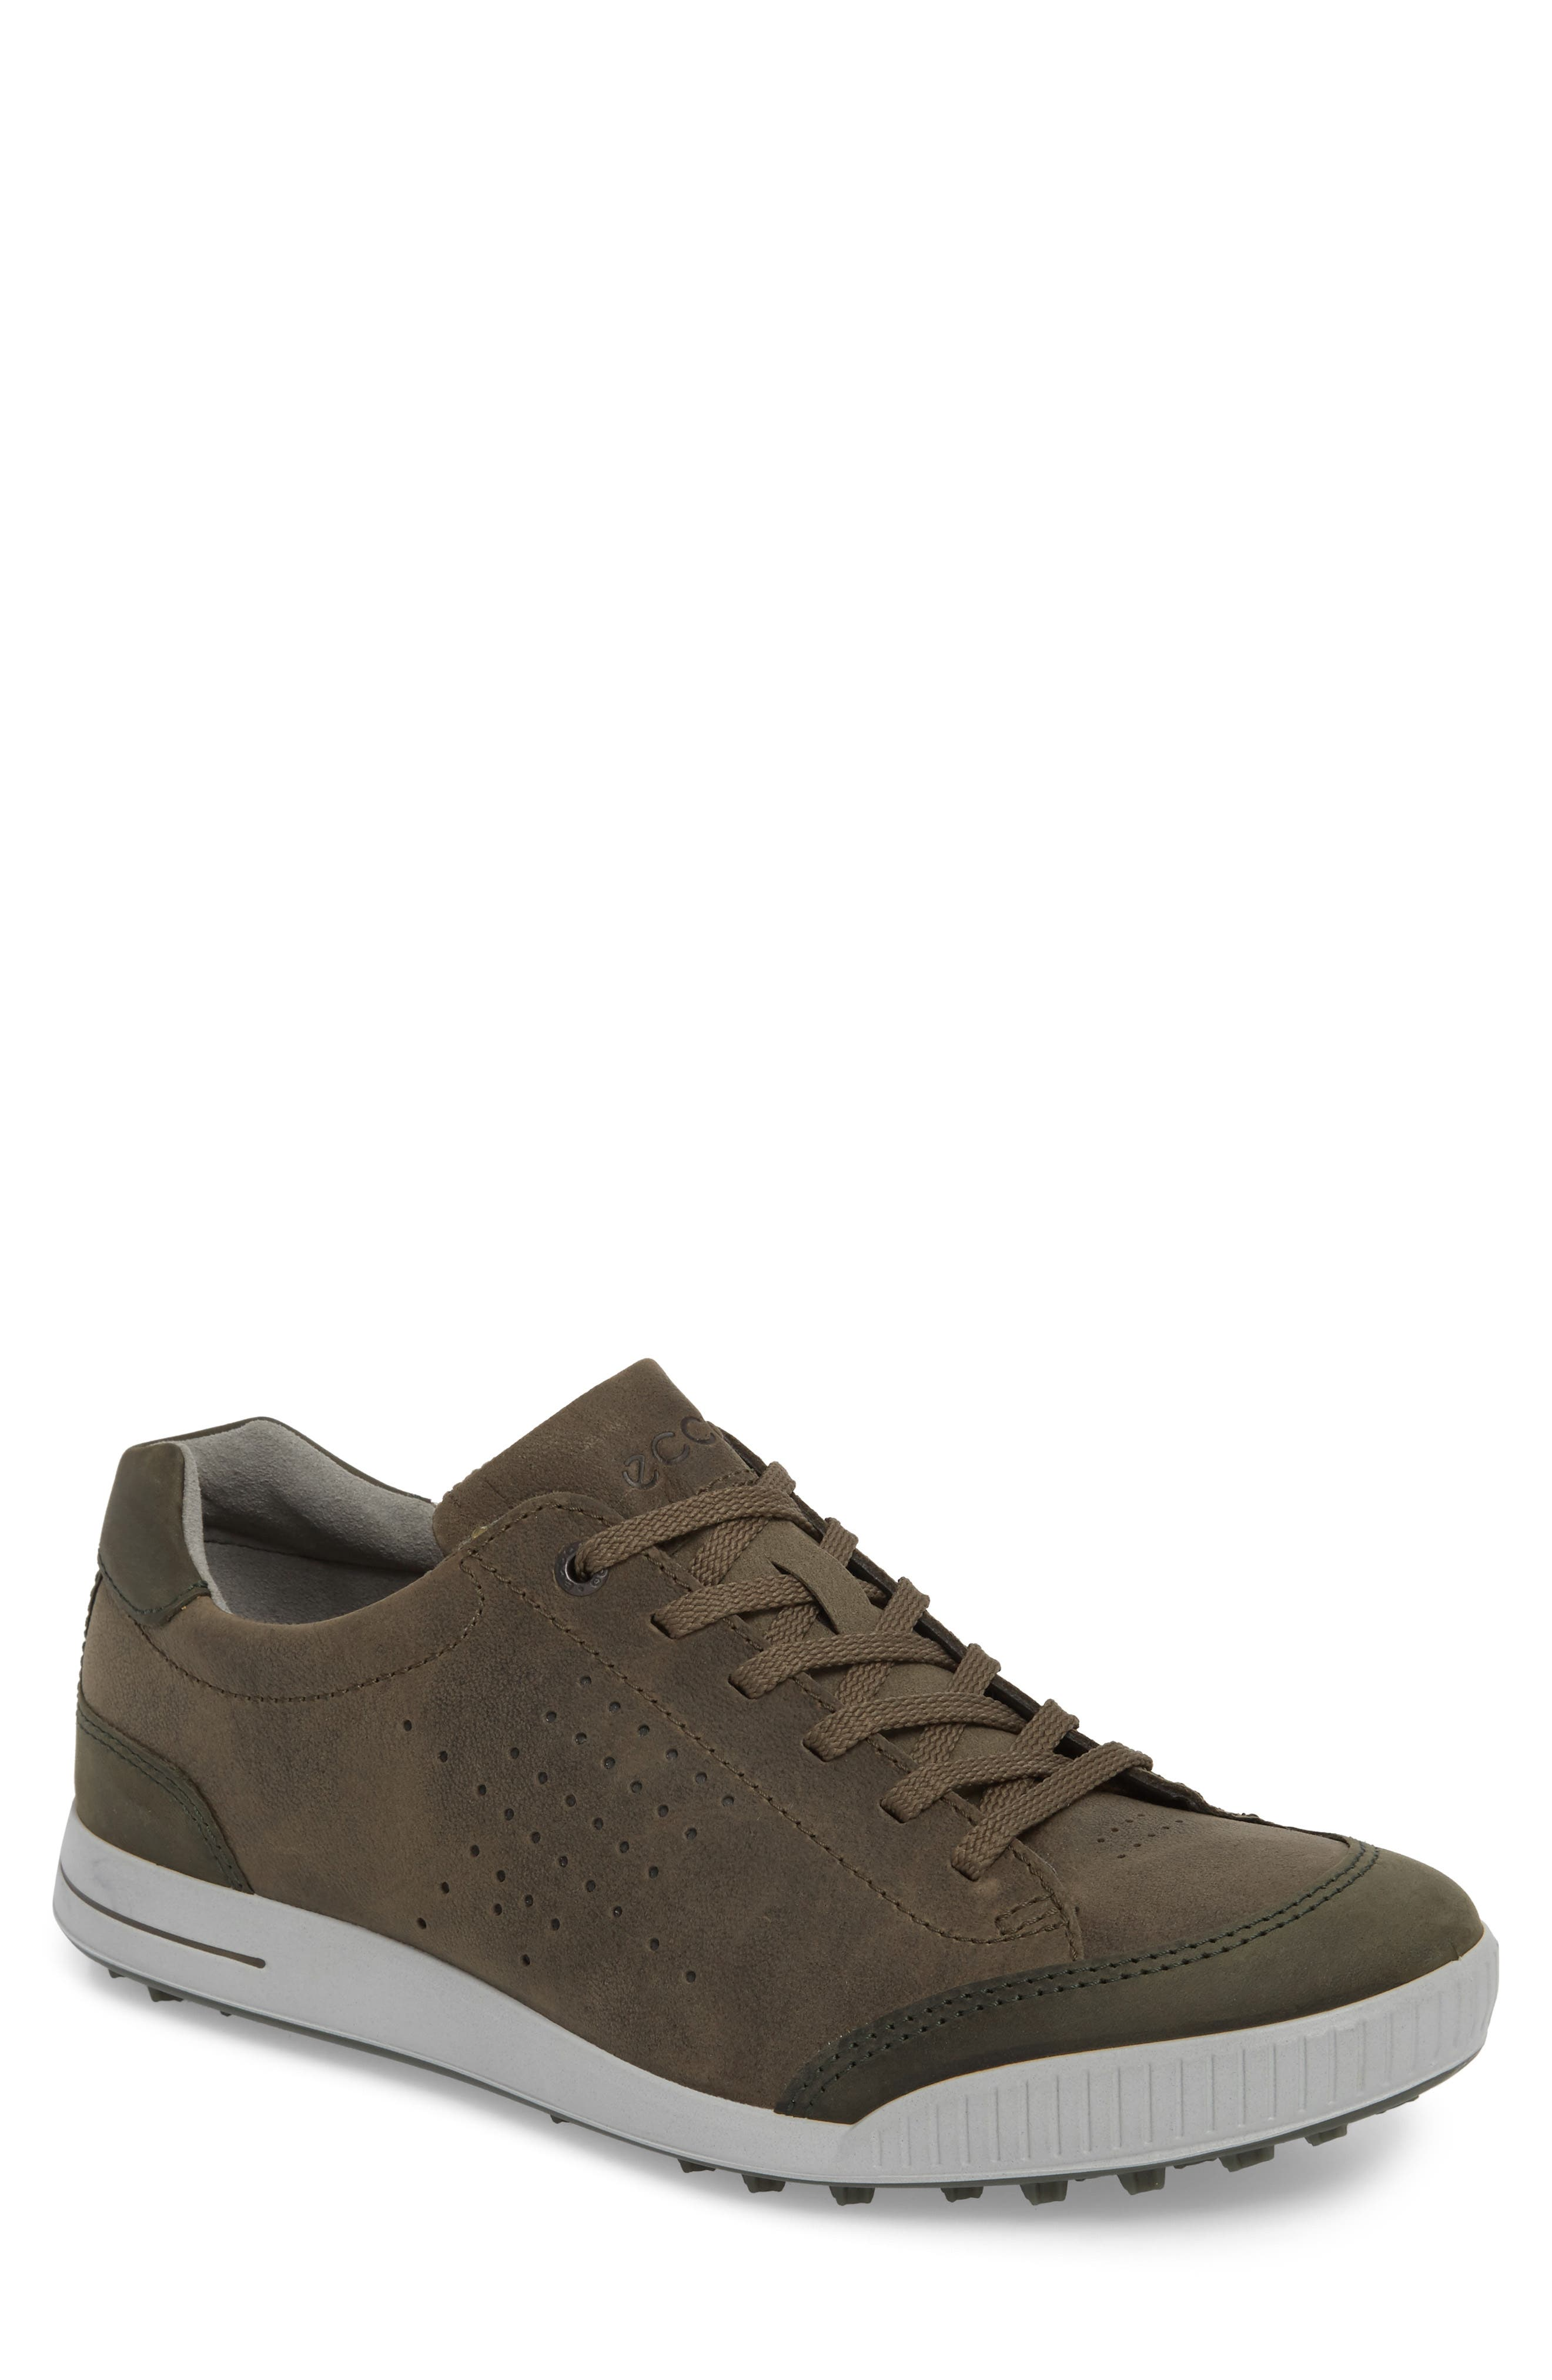 Street Retro HM Golf Shoe,                             Main thumbnail 1, color,                             Tarmac/ Deep Fore Leather